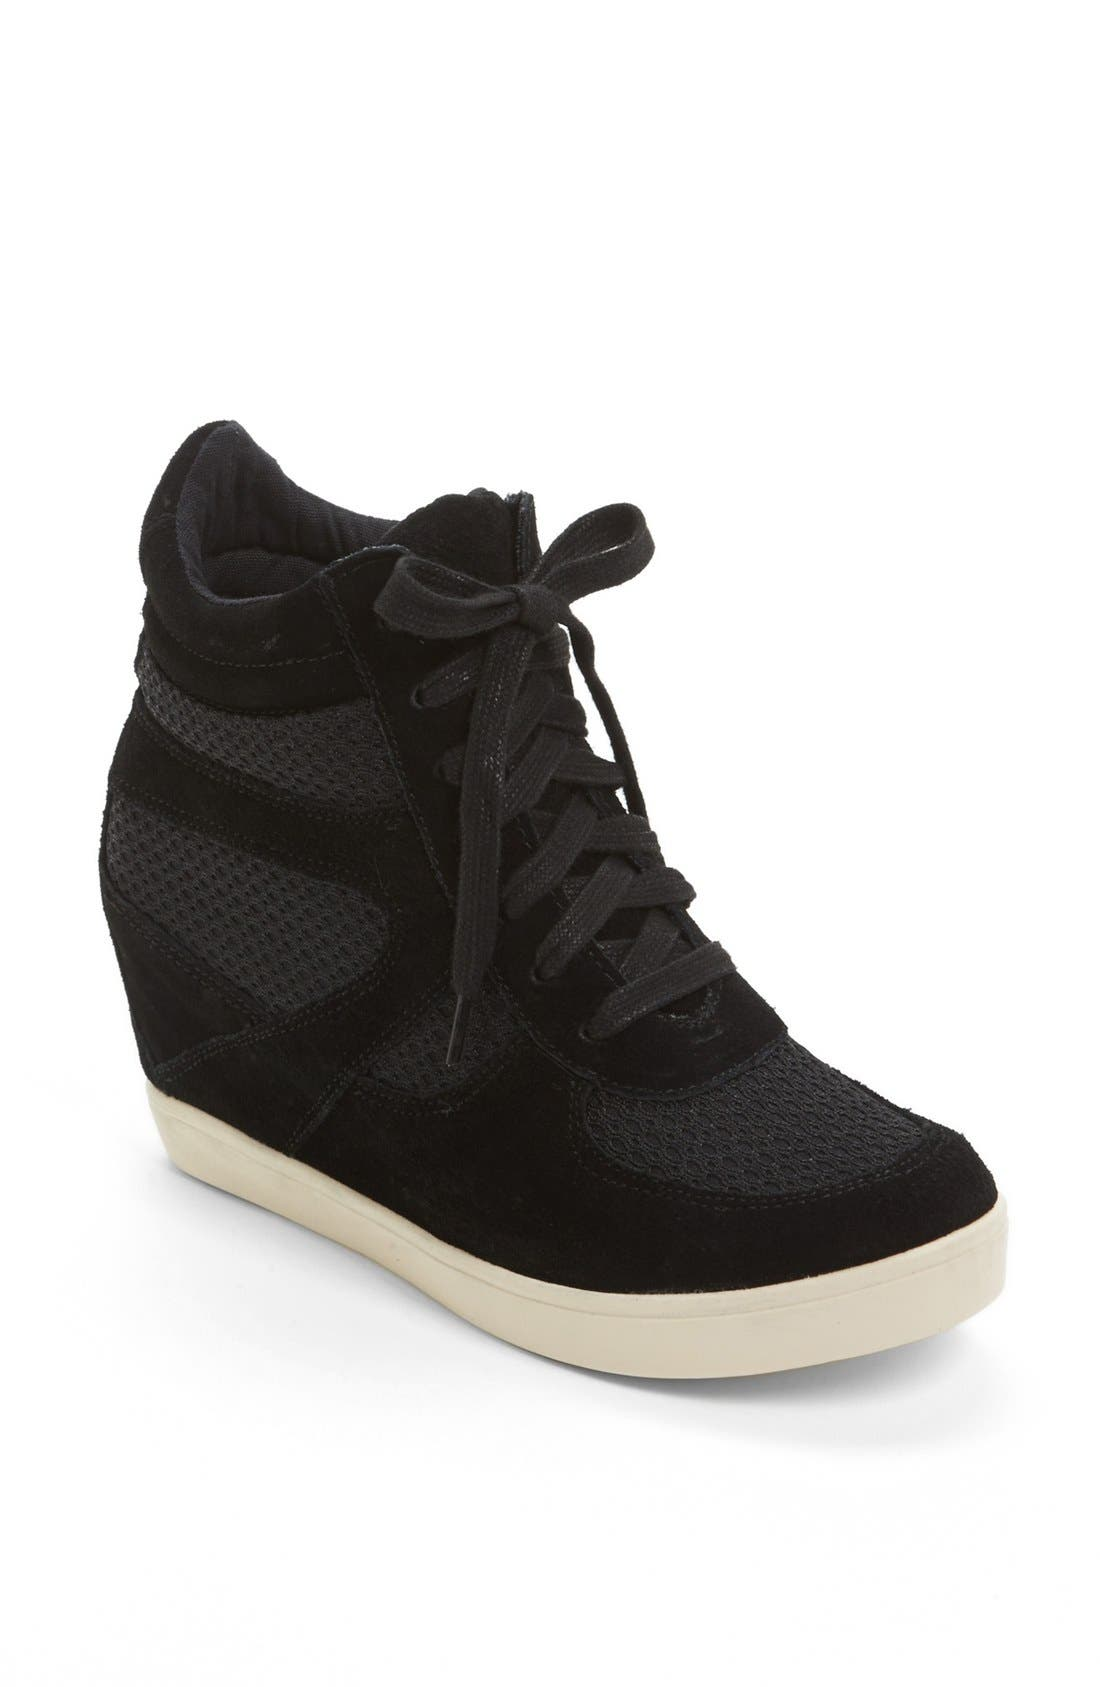 Main Image - Steve Madden 'Olympa-X' Wedge Sneaker